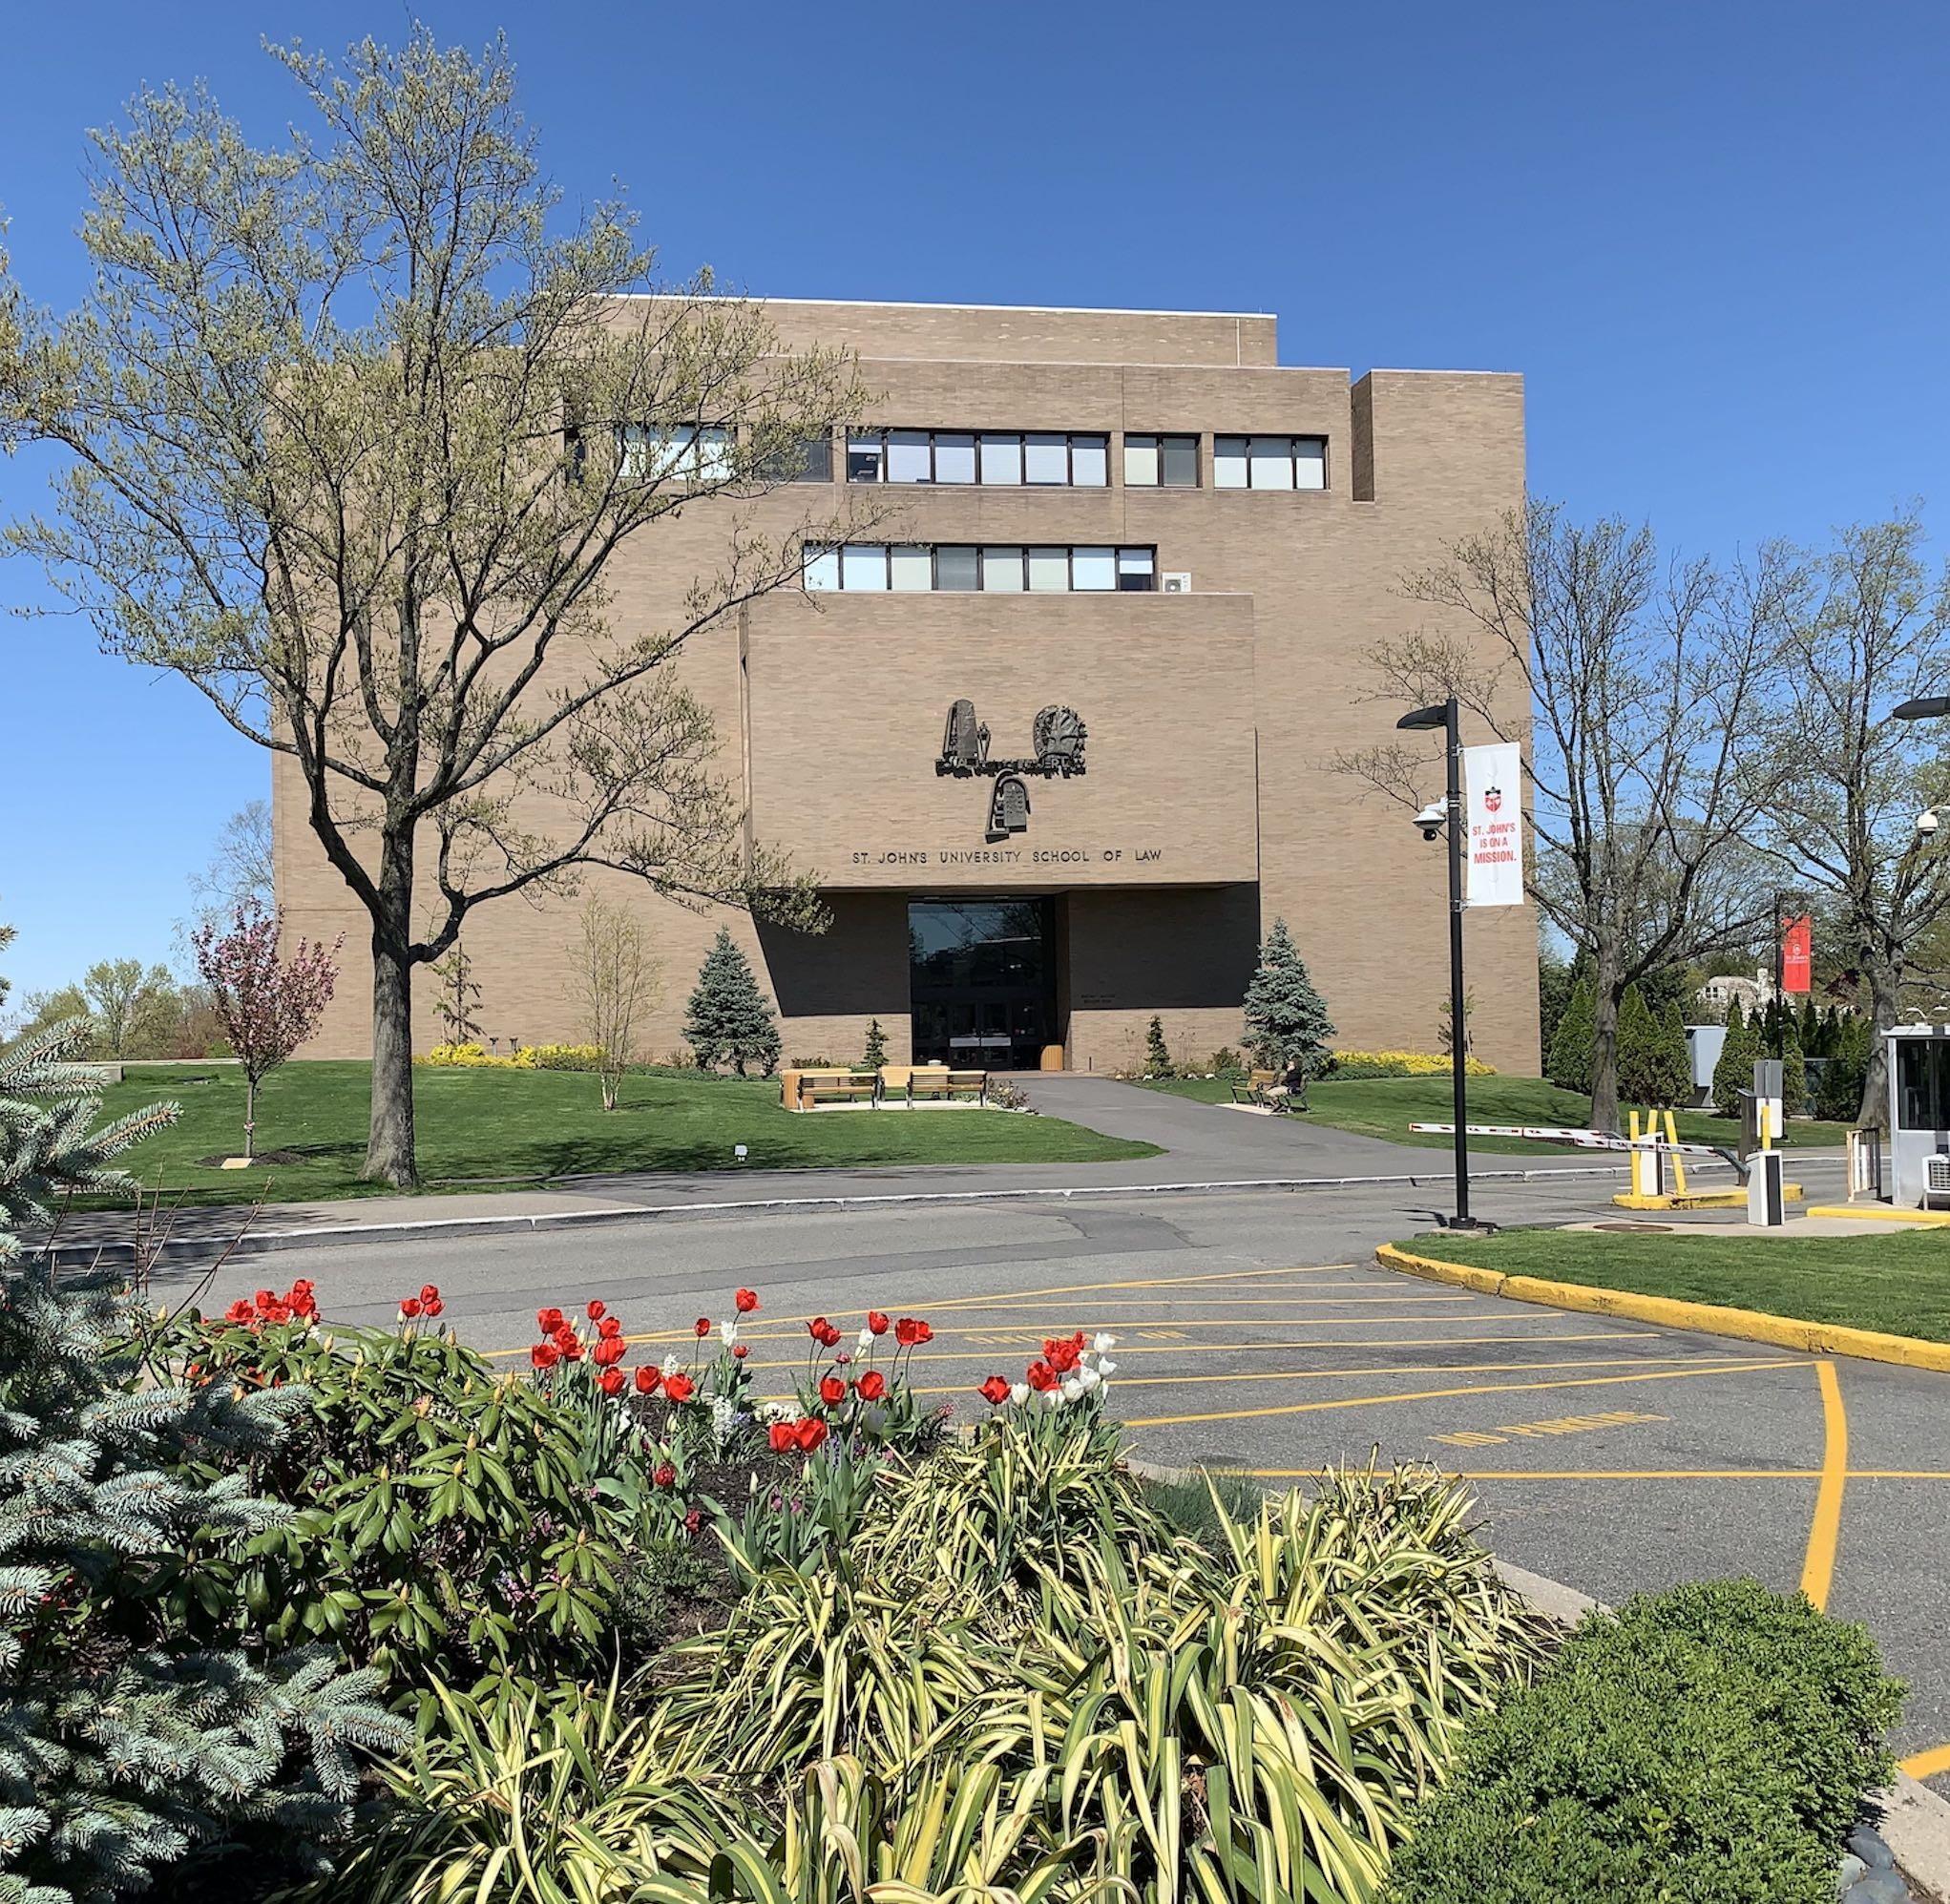 St  John's University School of Law | LinkedIn